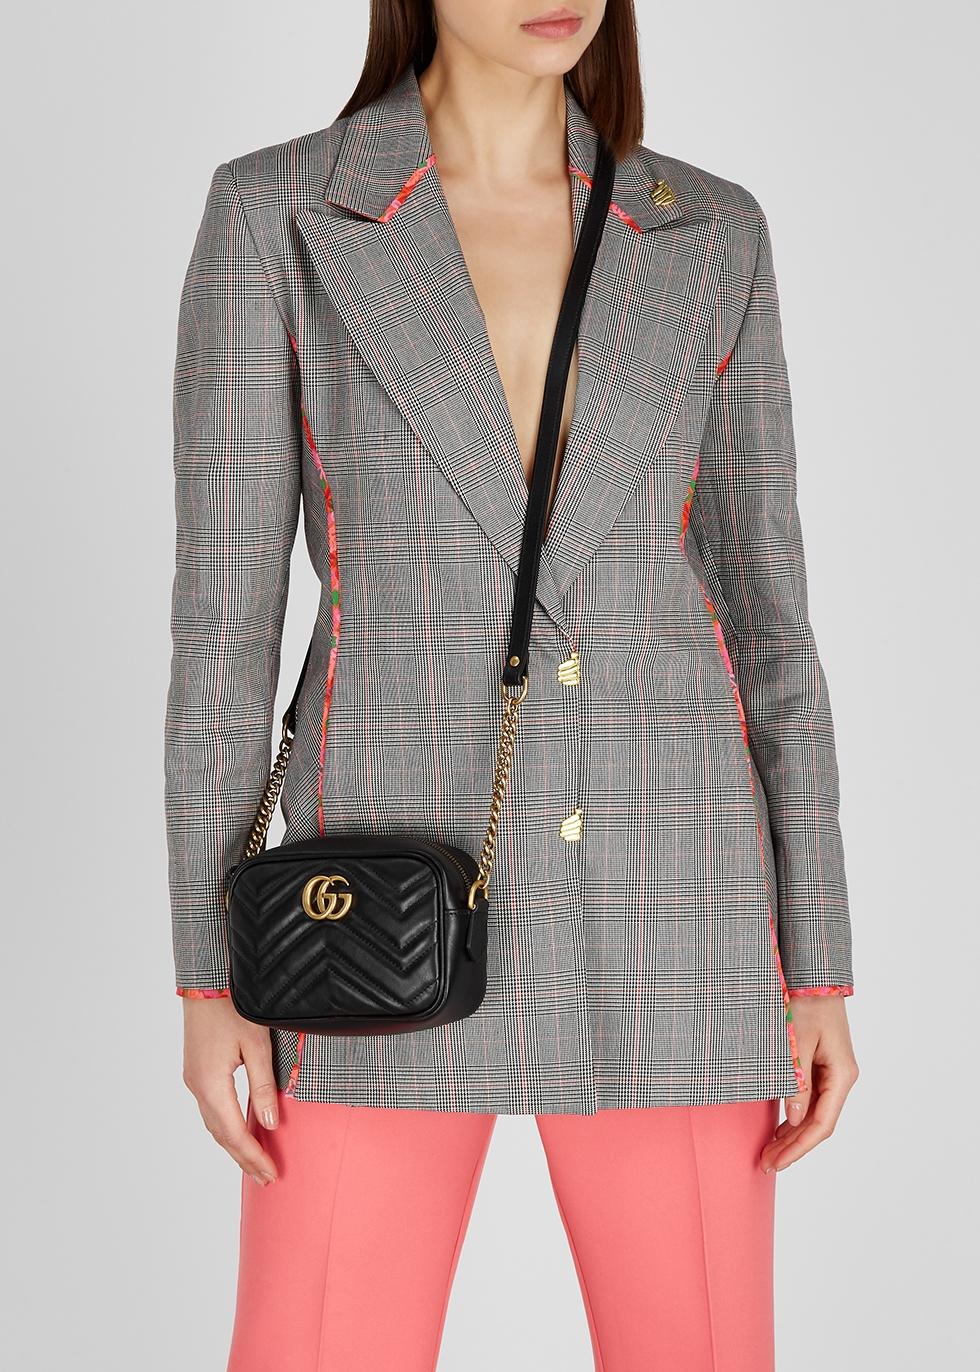 73570c2c0 Women's Designer Cross-Body Bags - Harvey Nichols